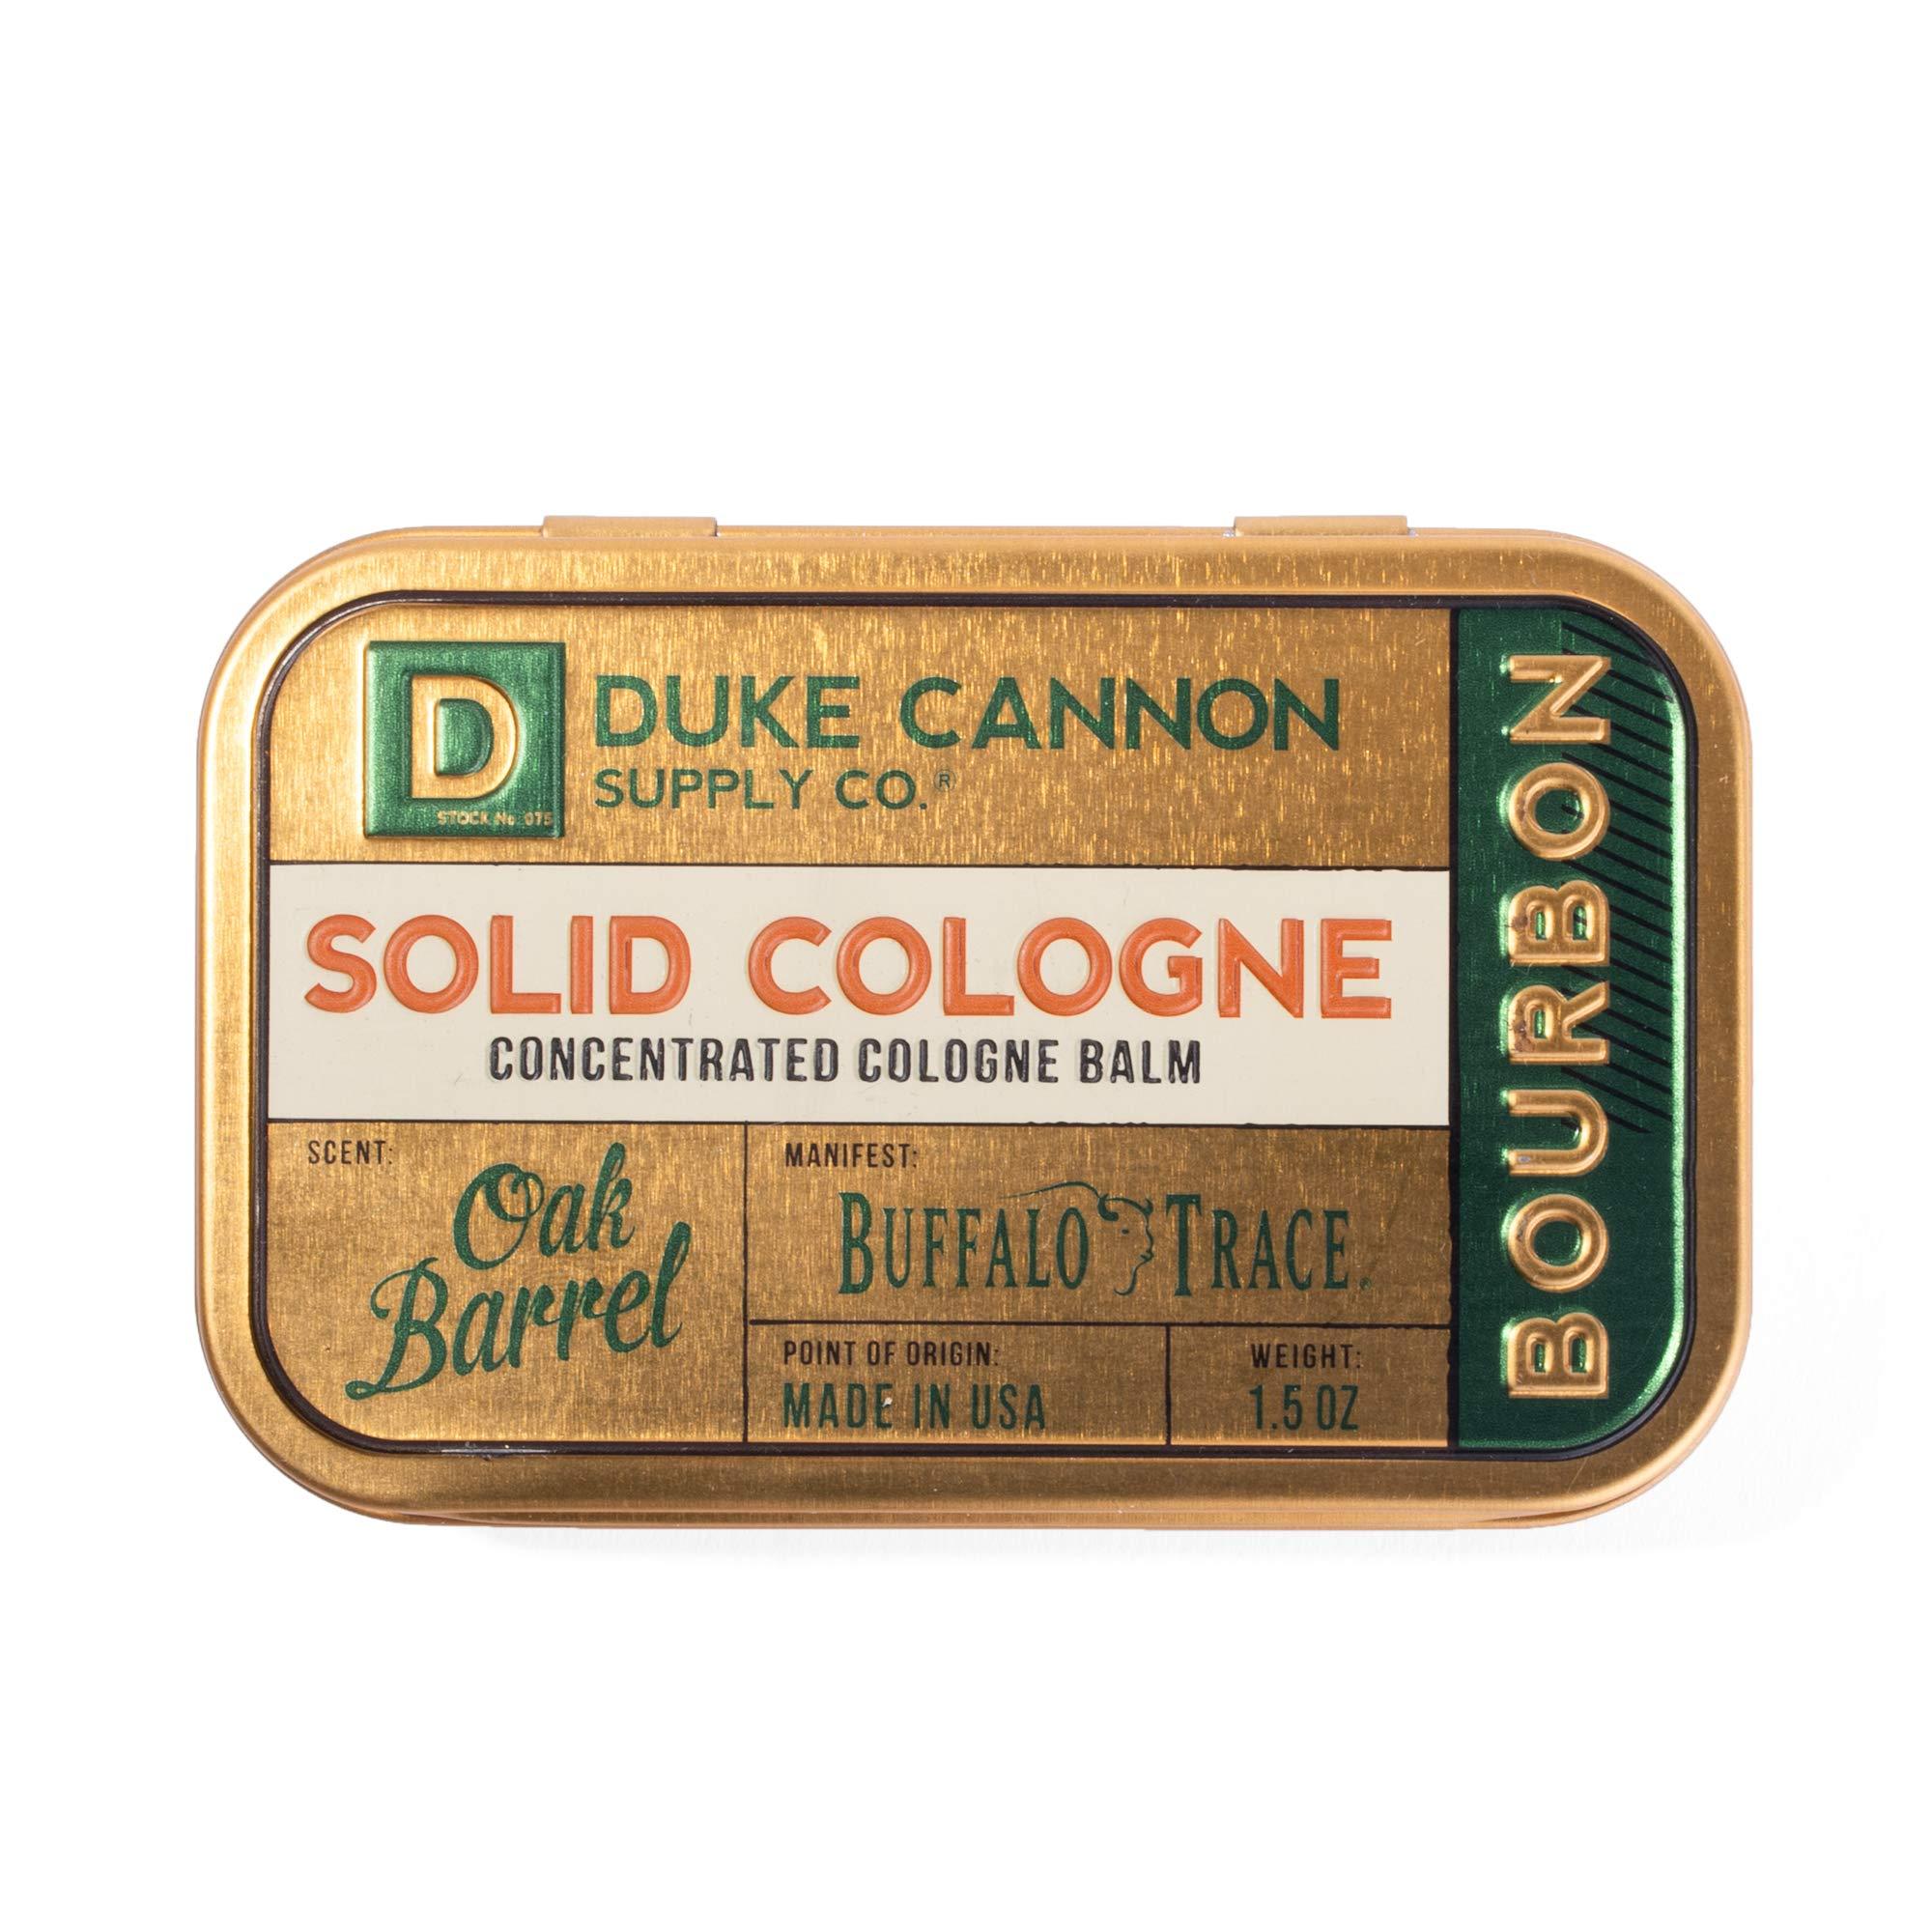 Duke Cannon Men's Solid Cologne, 1.5oz. - Bourbon Trail (Buffalo Trace Bourbon Fragrance) by Duke Cannon